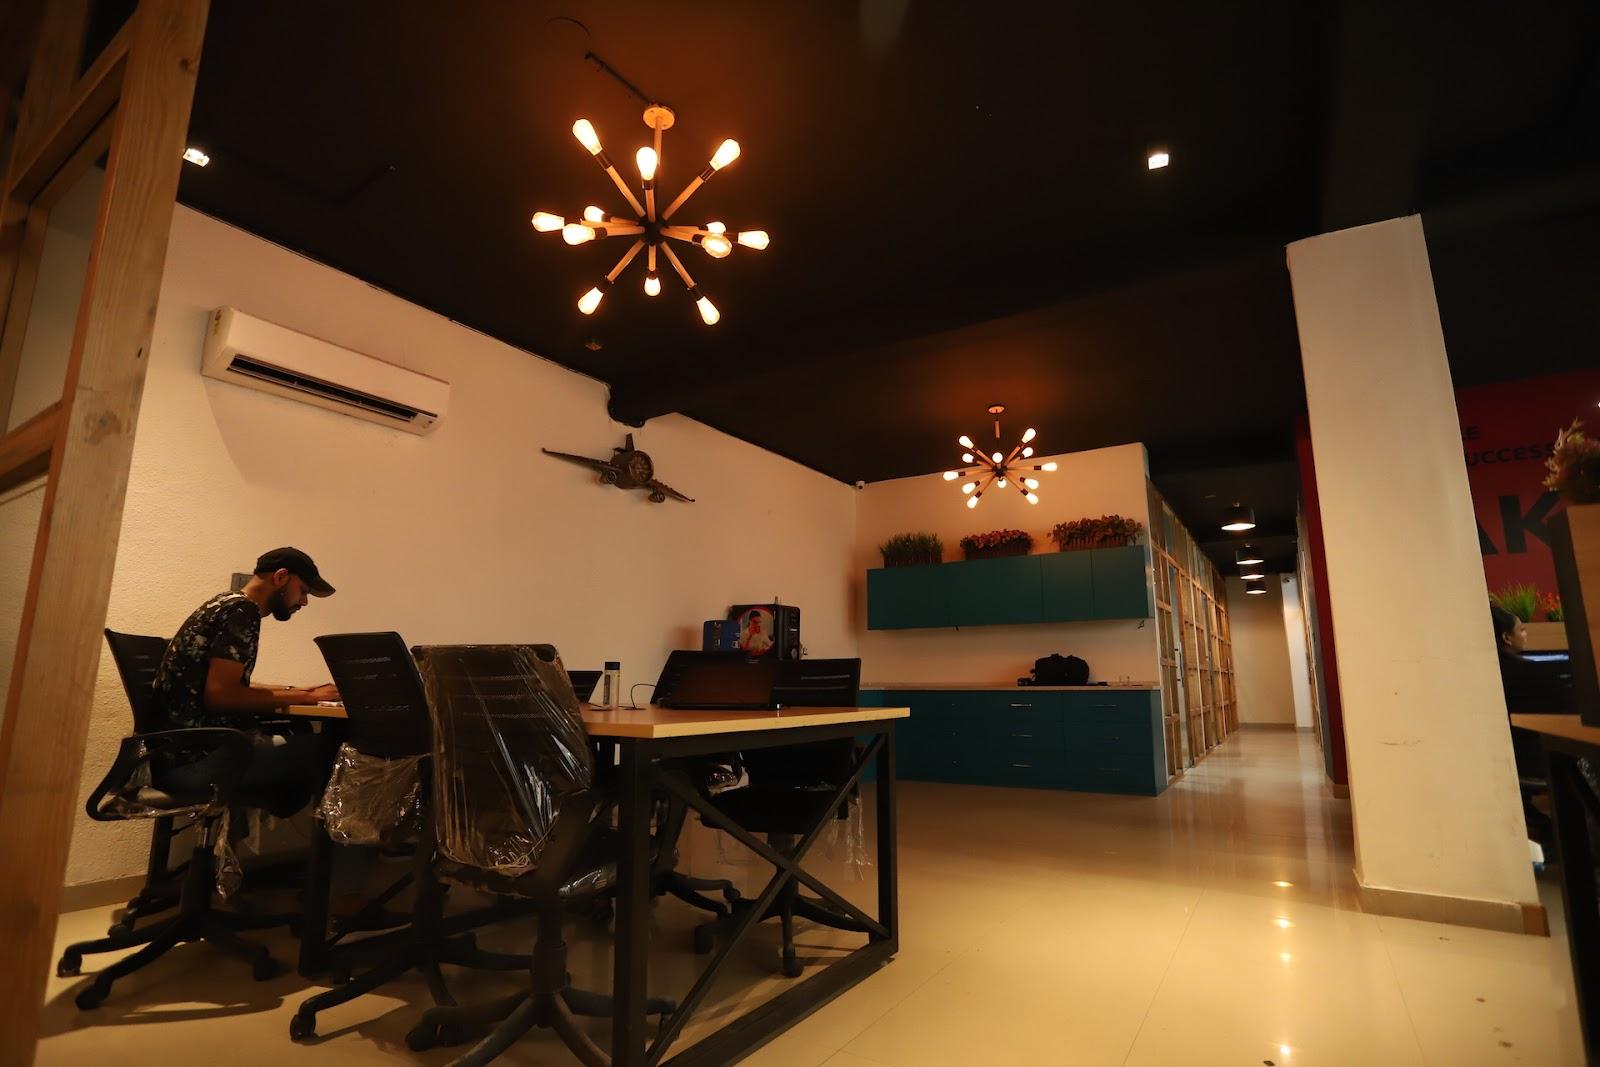 Kinnoti Coworking Space in Noida